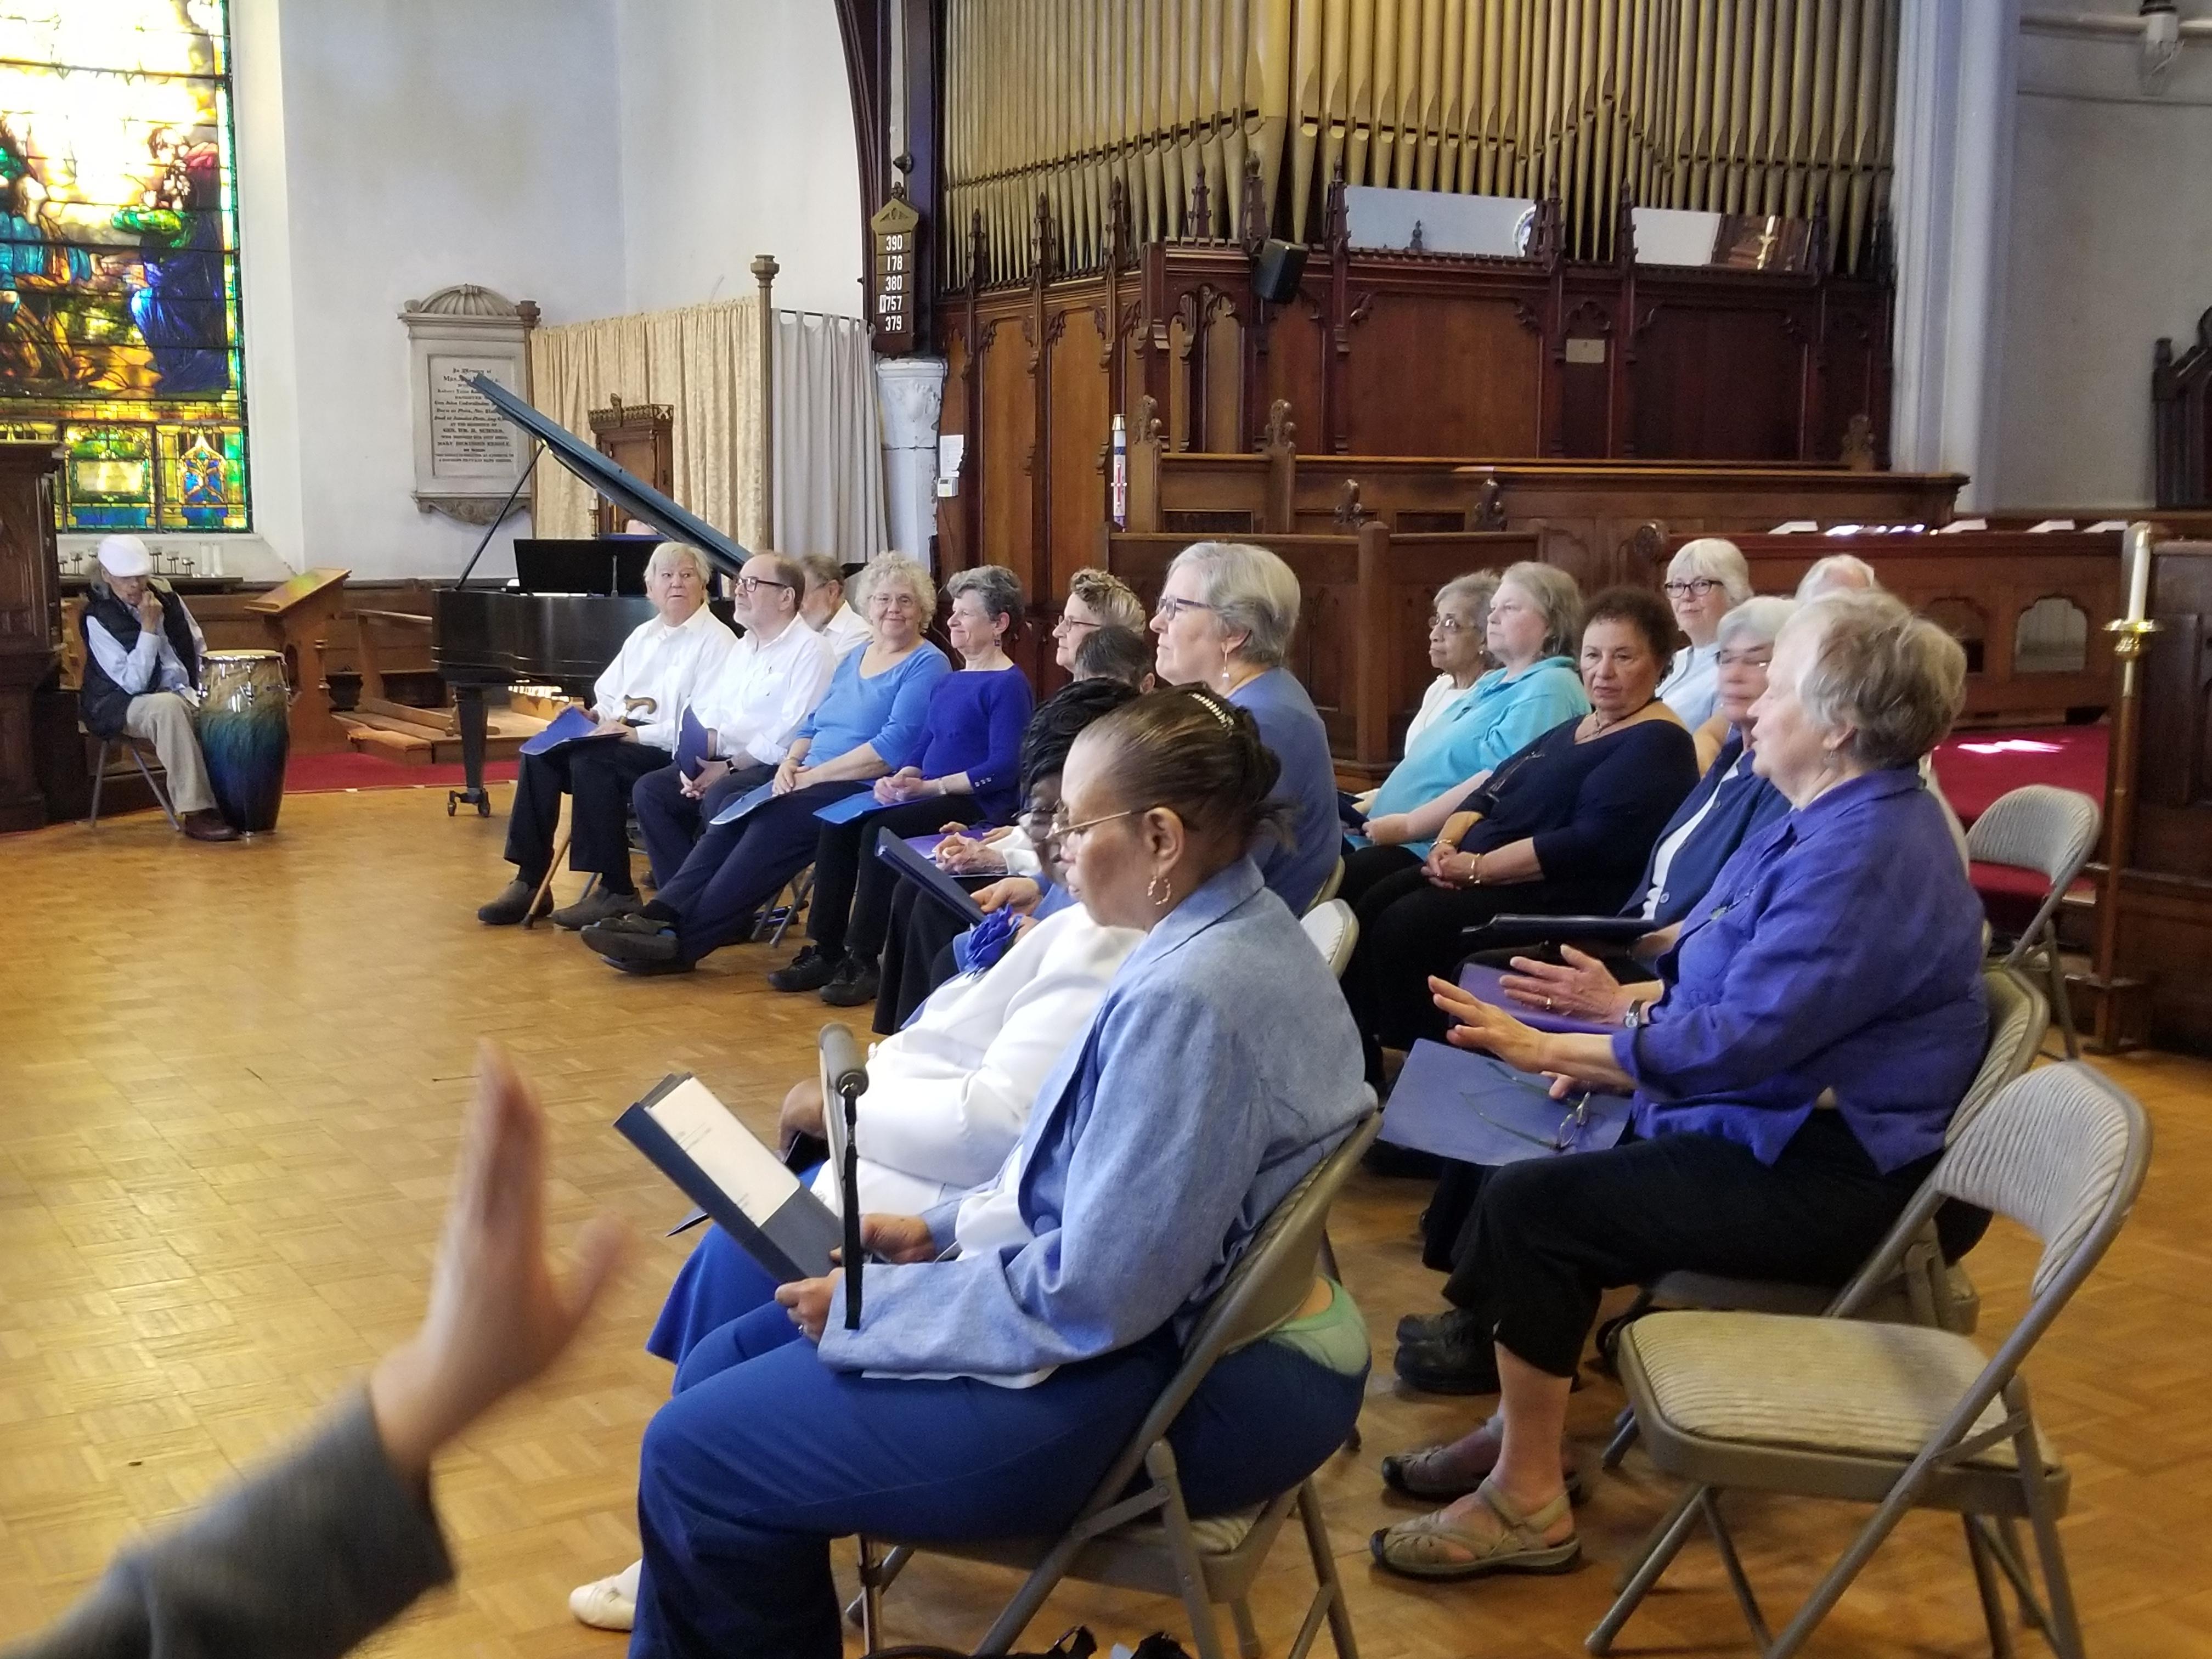 Chorus practice with PACE participants